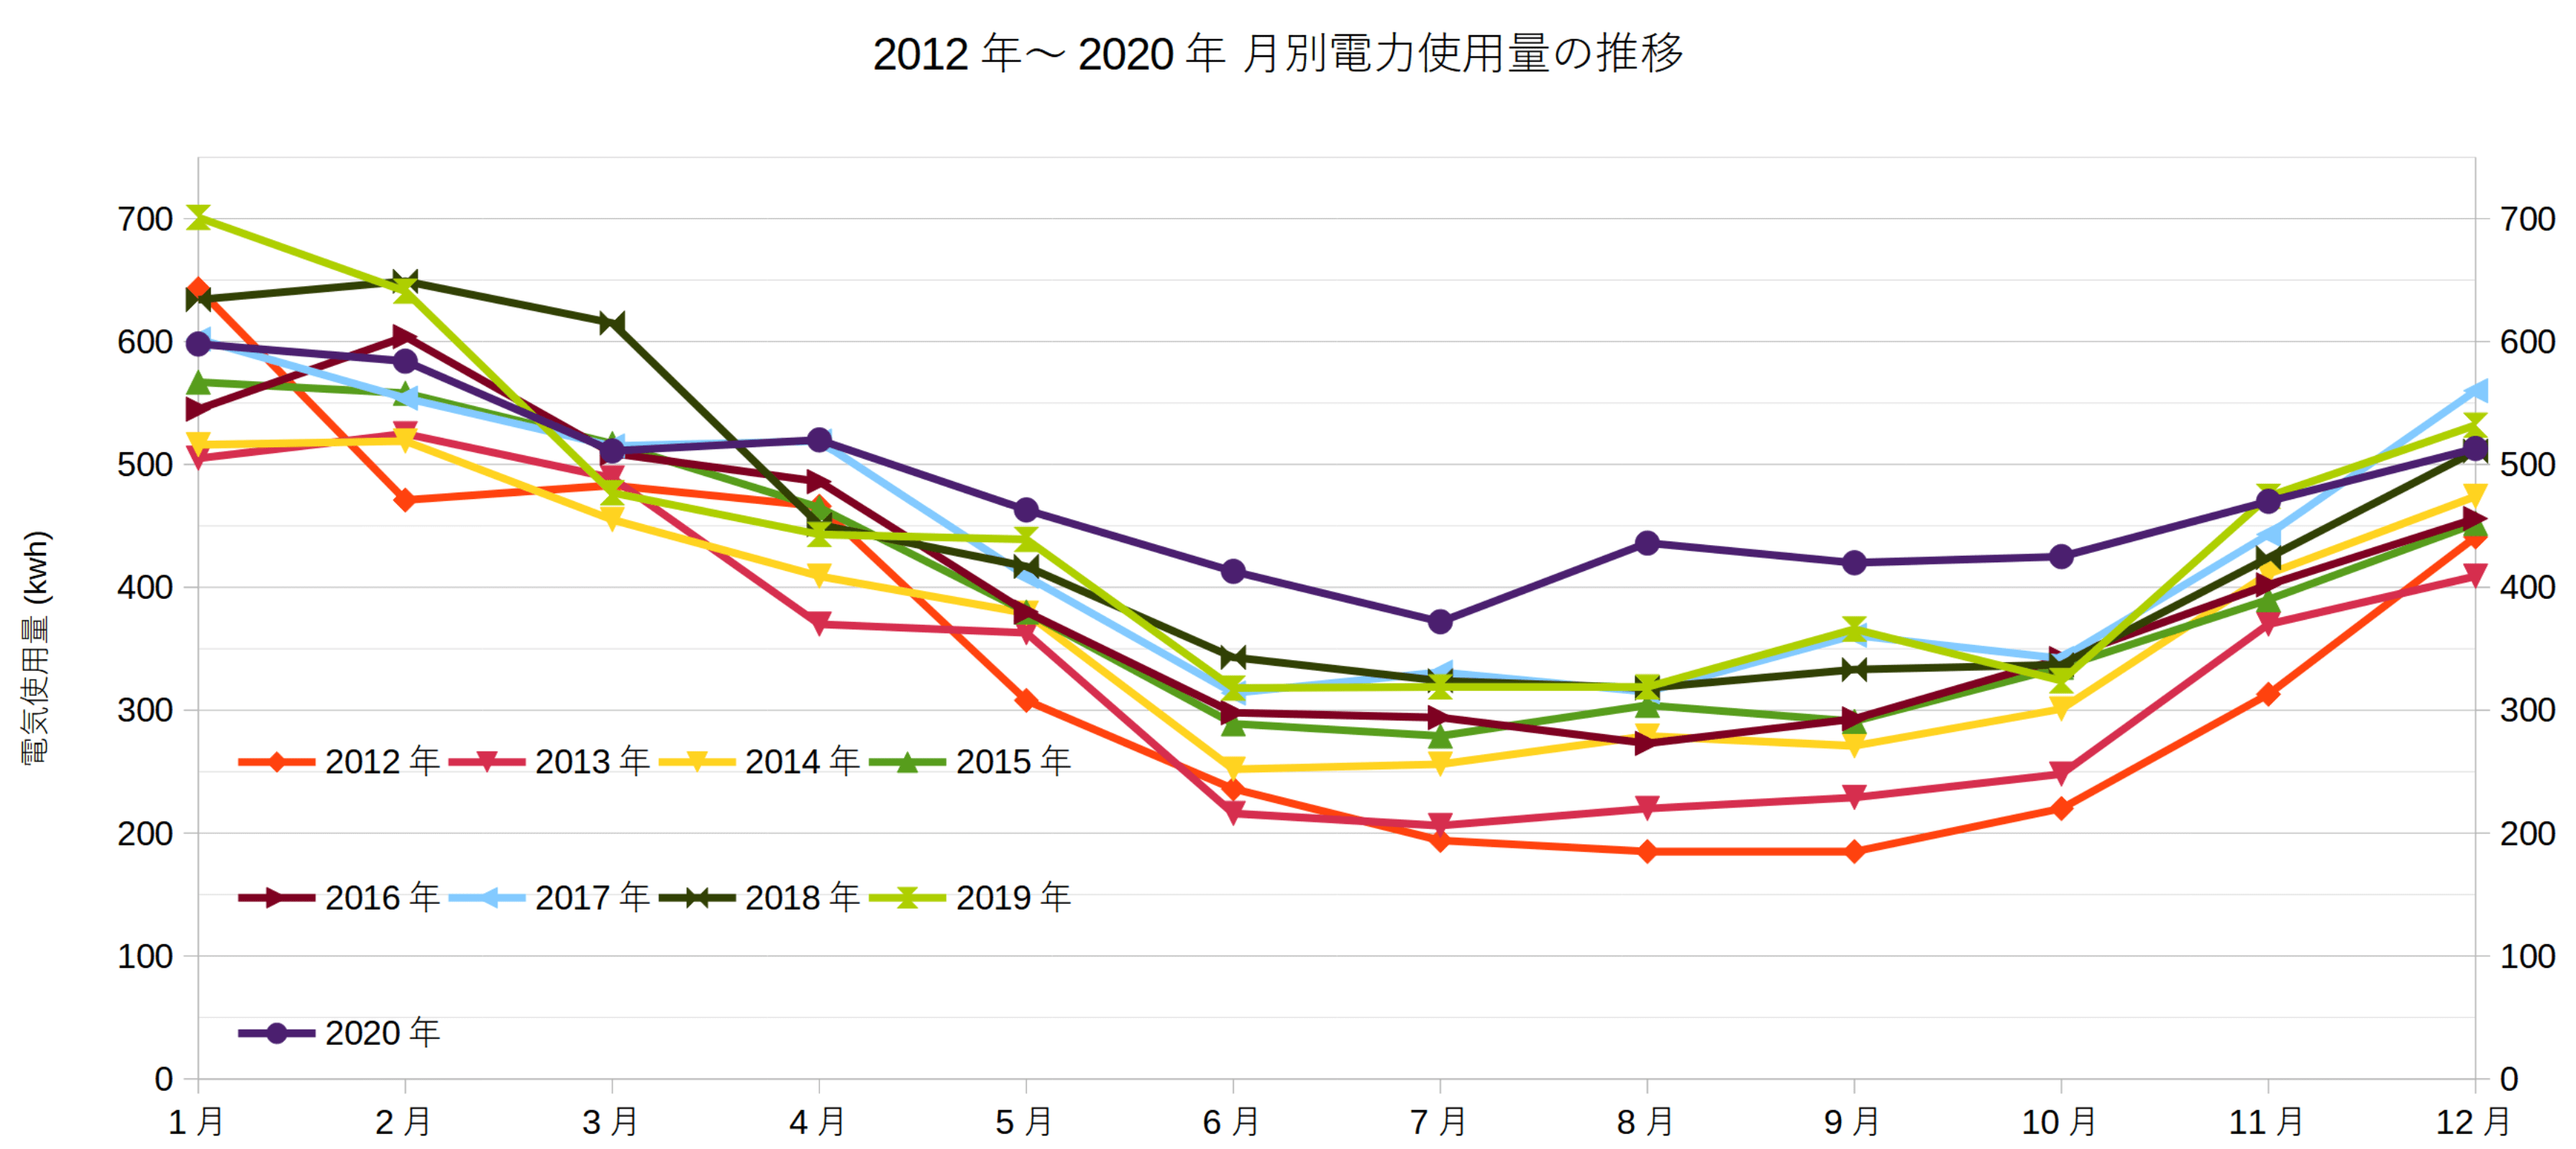 2012年~2020年 月別電力使用量の推移